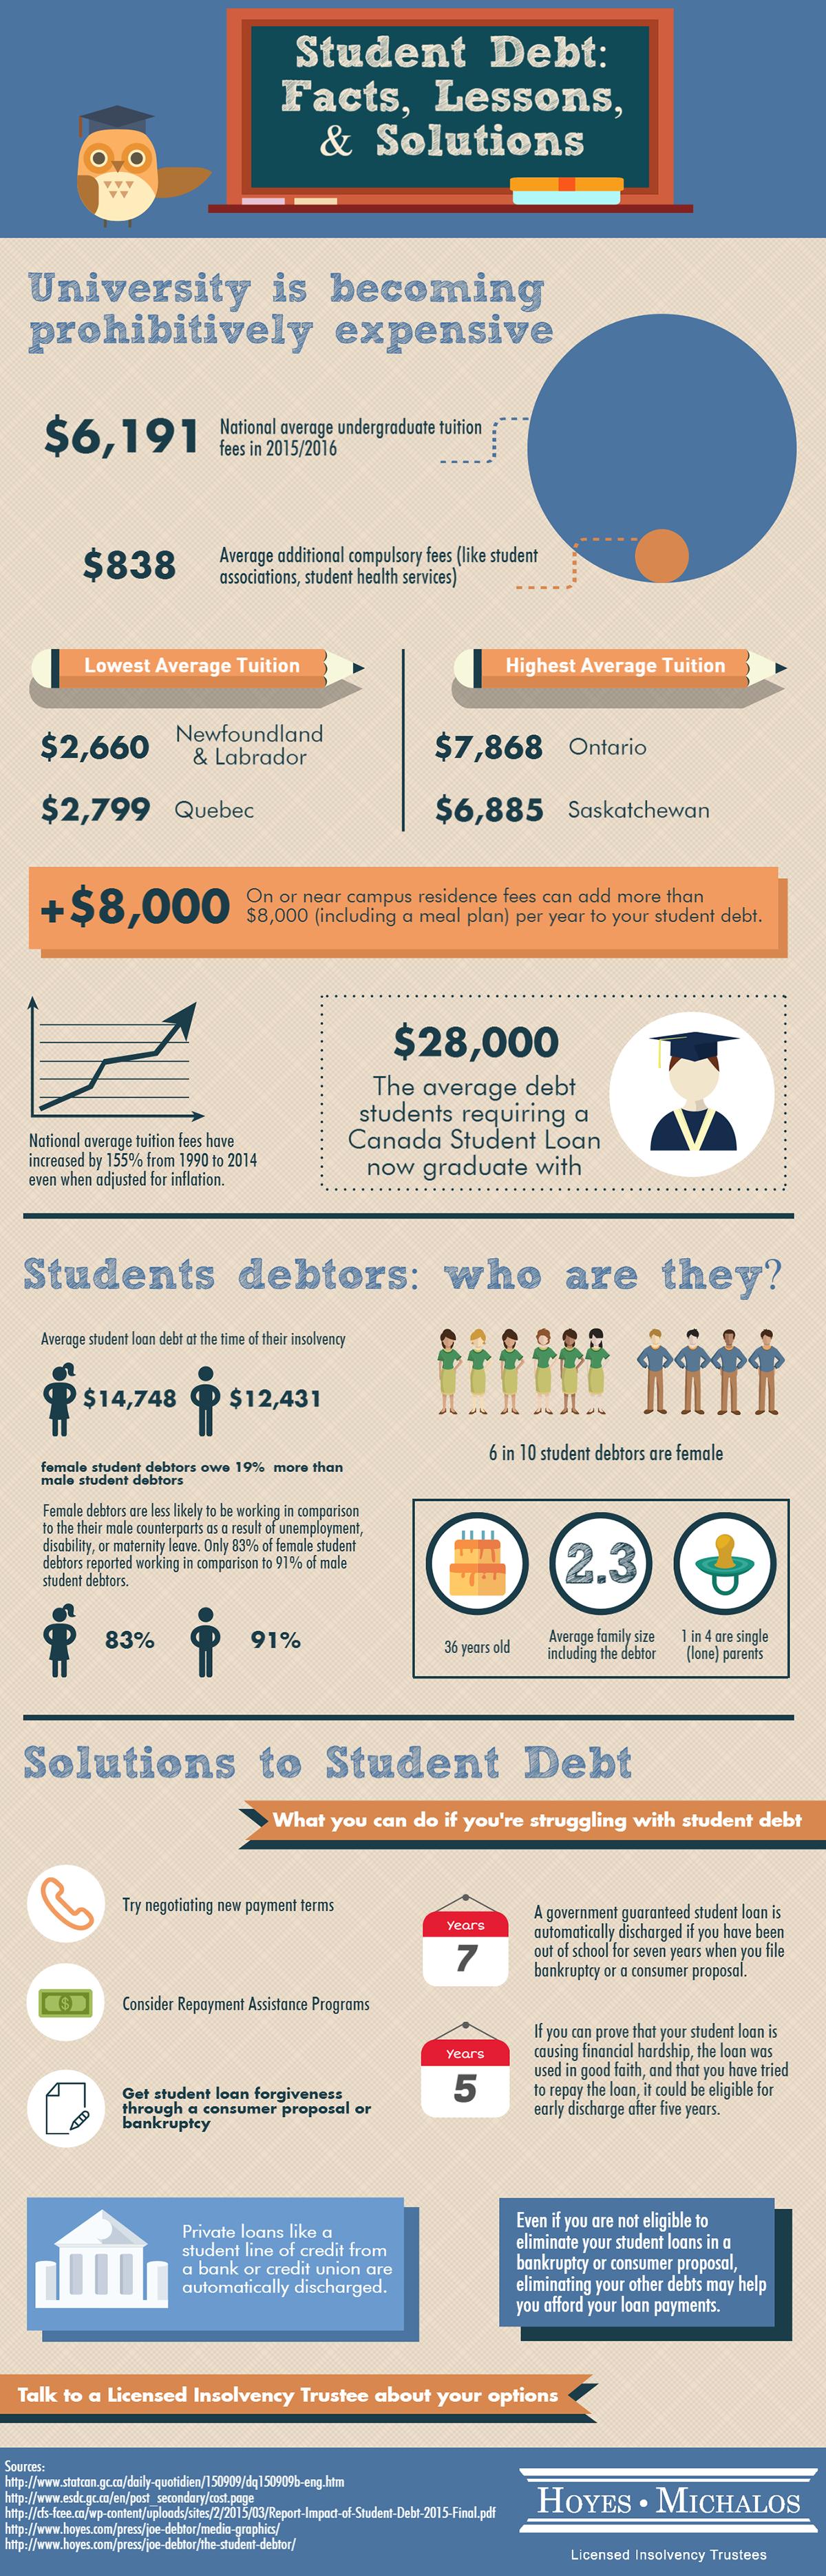 Student Debt Infographic